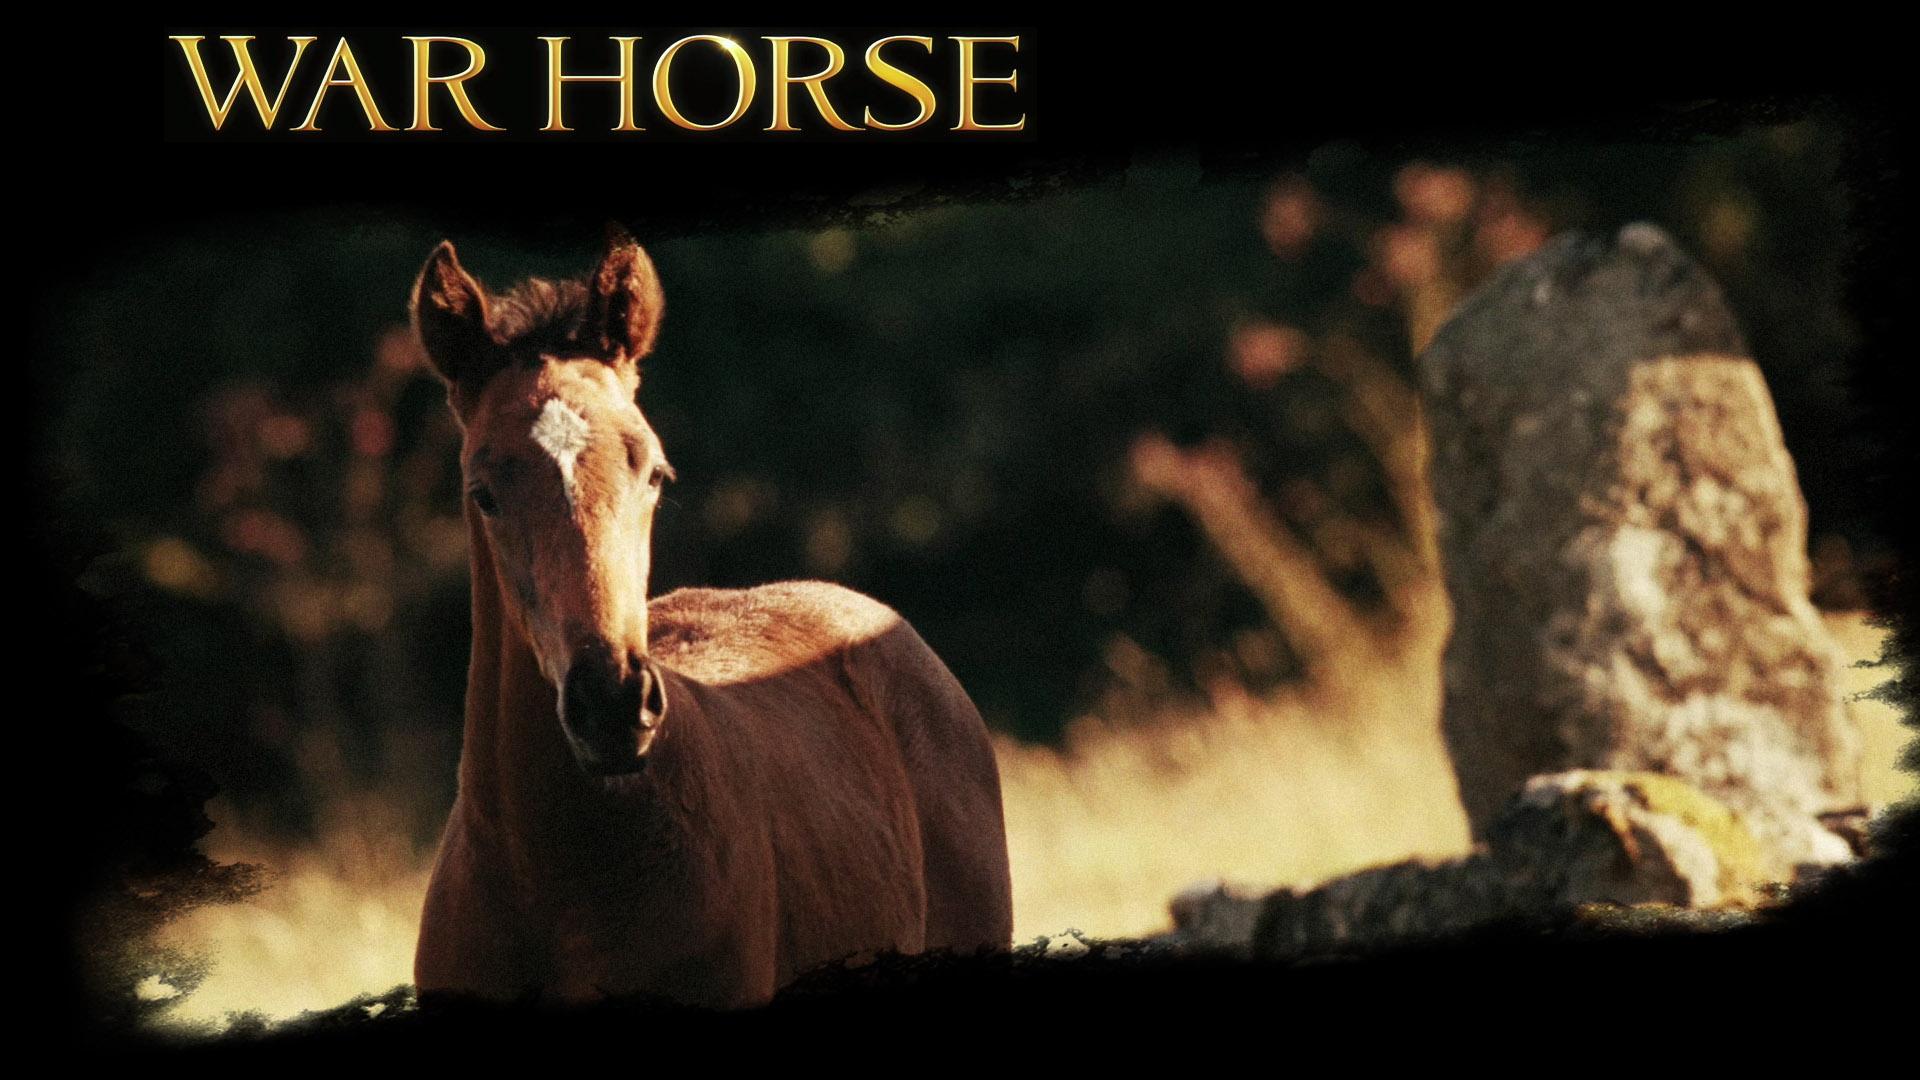 Essays on the movie war horse